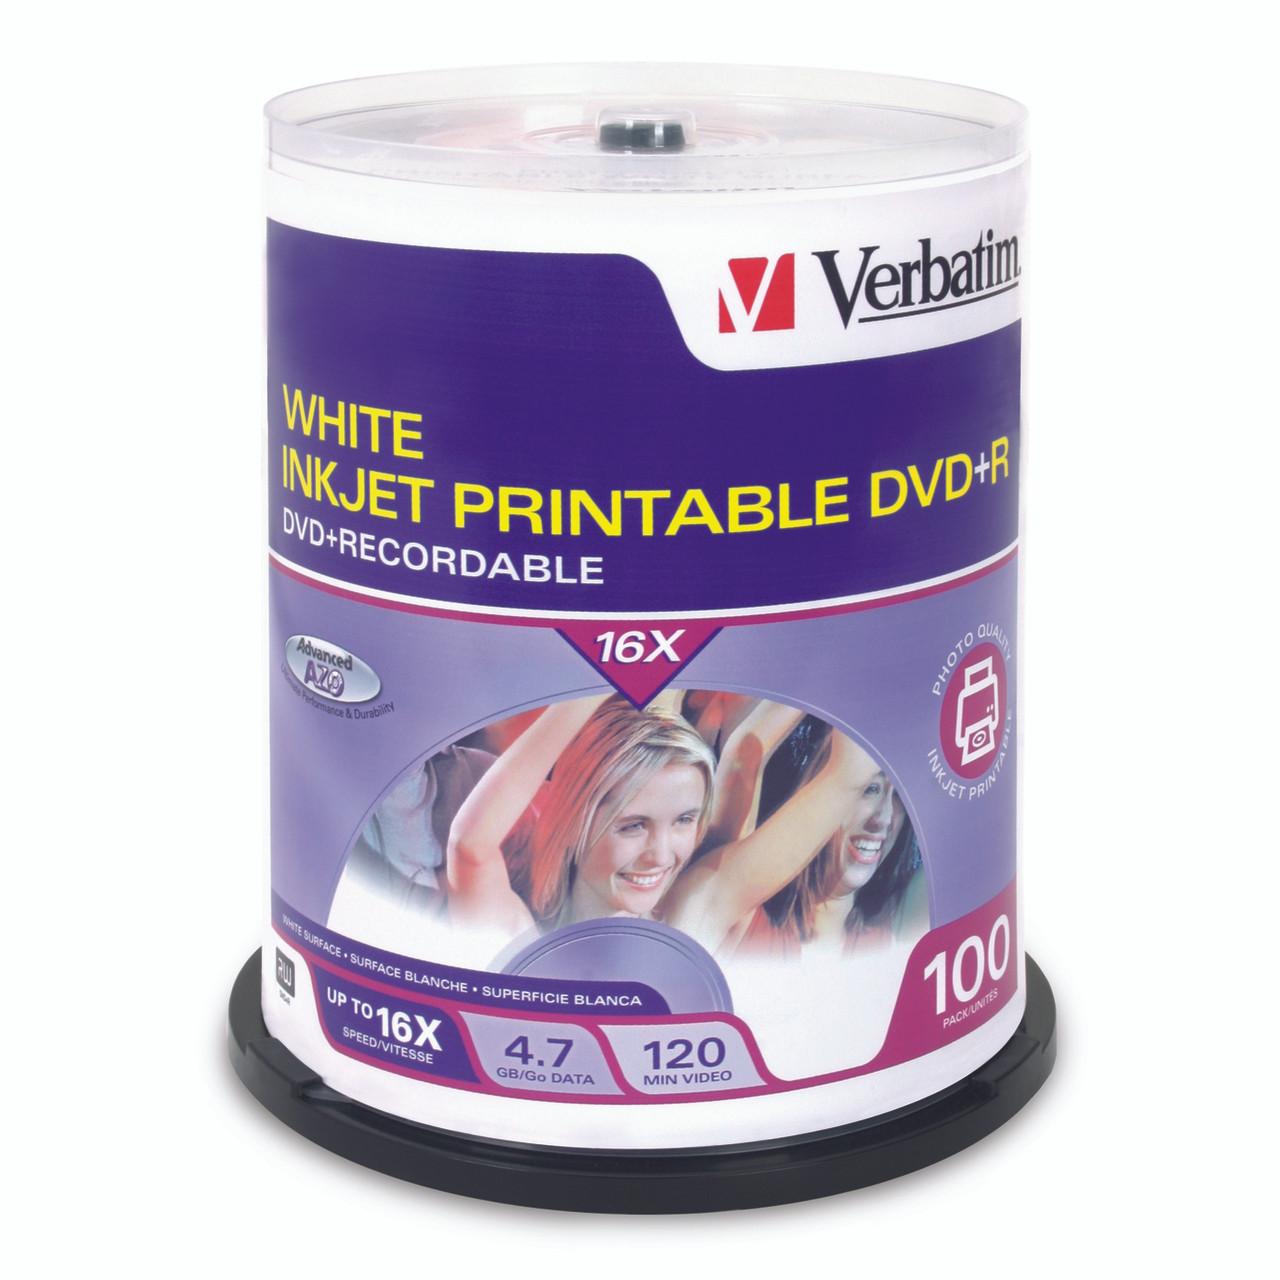 Verbatim DVD+R - 4.7GB White Inkjet Printable (4 Pack of 100 Pieces)